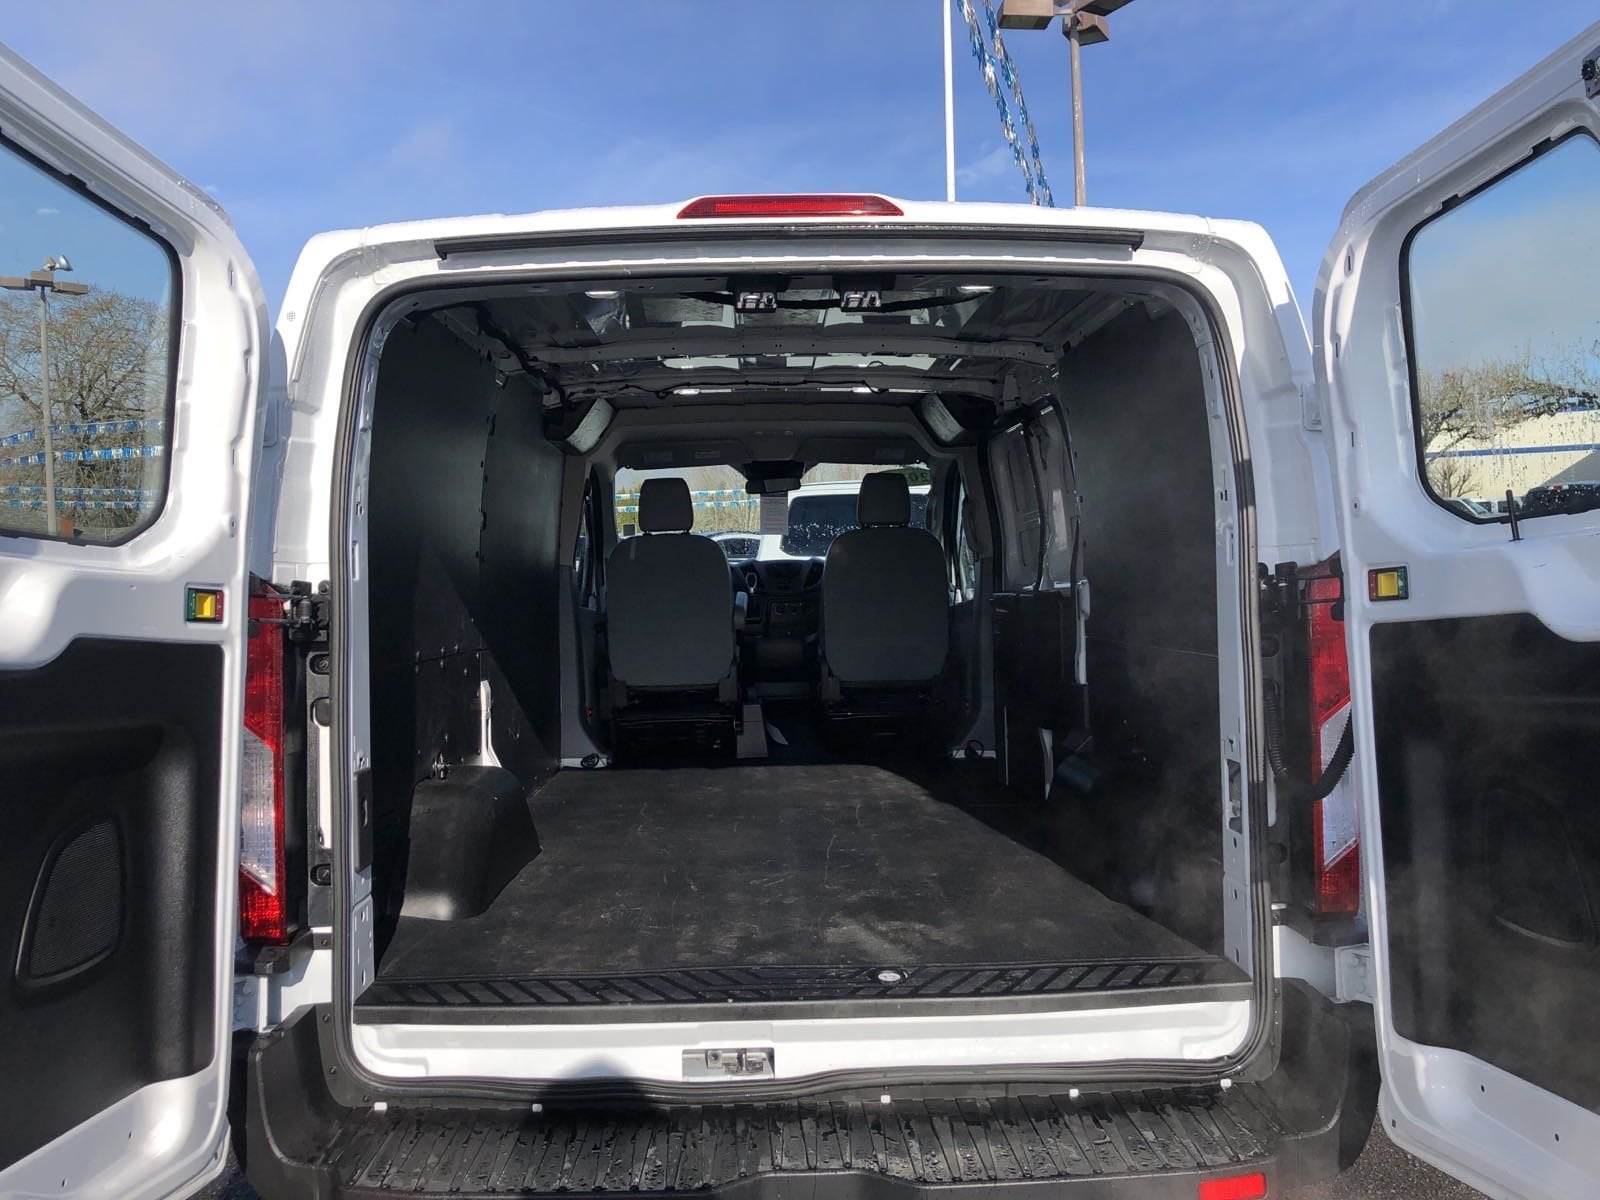 2019 Transit 150 Low Roof 4x2, Empty Cargo Van #CV1295 - photo 1